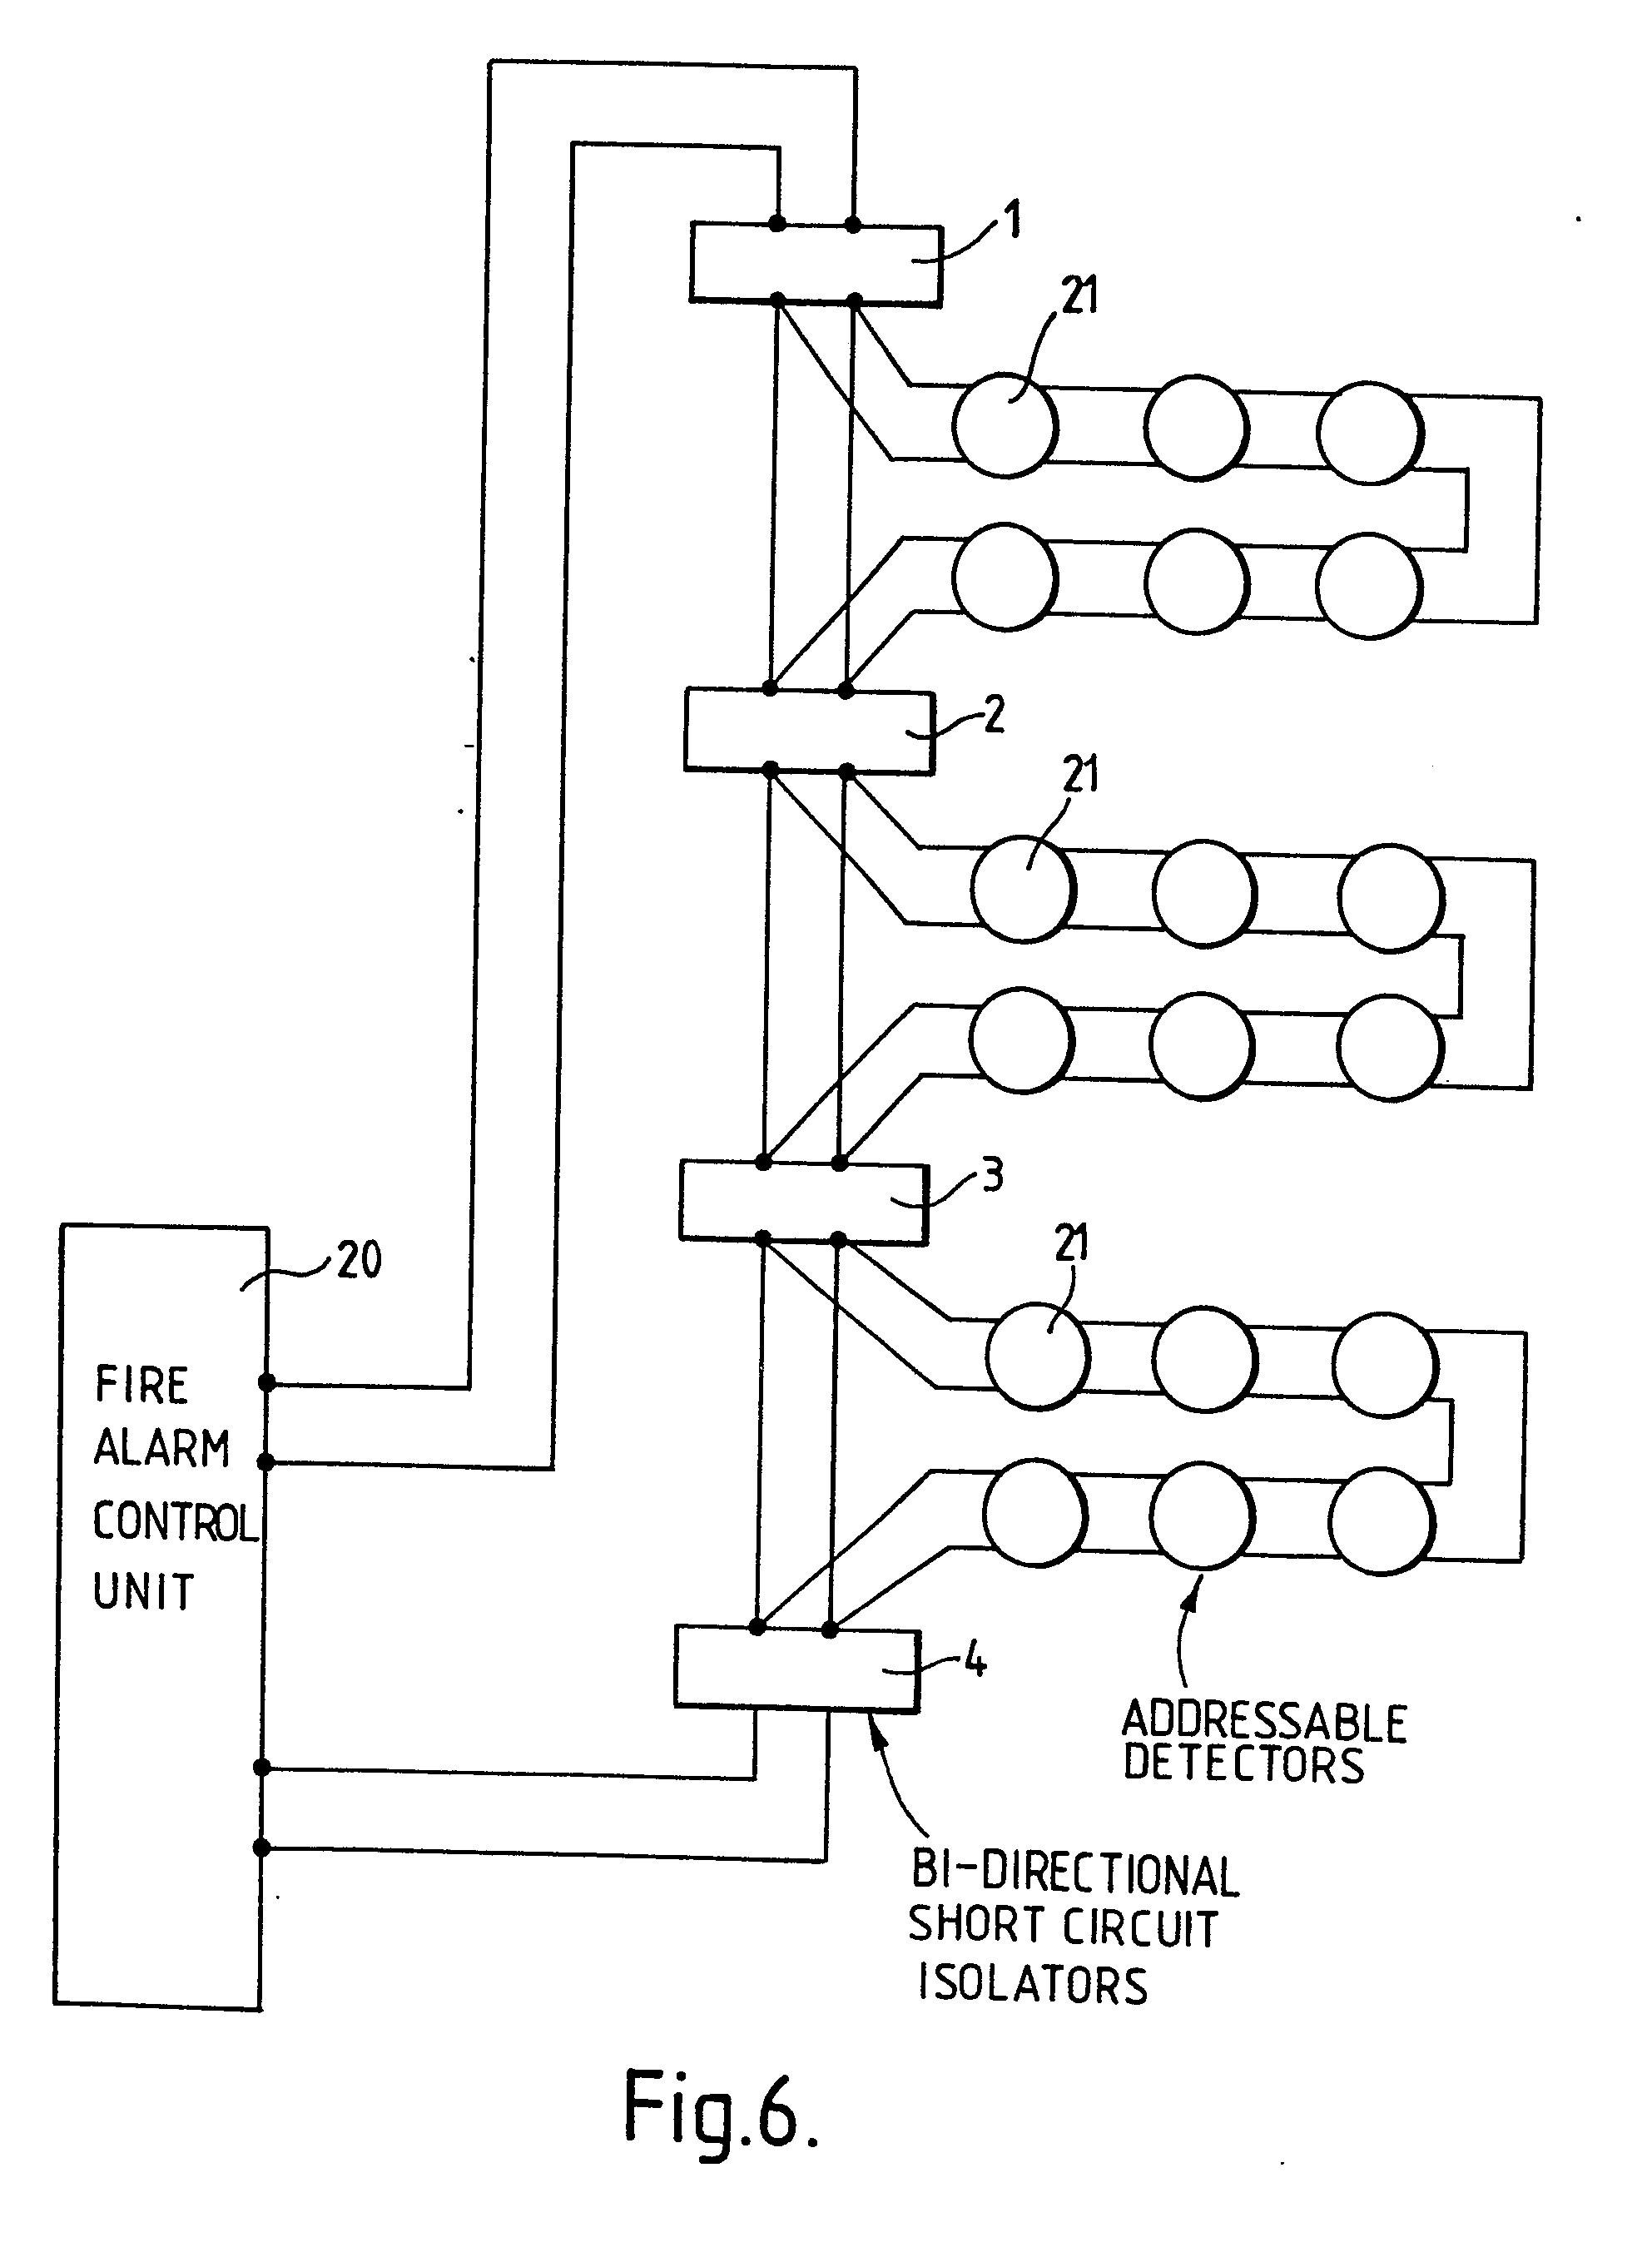 Fire Alarm Wiring Diagram Pdf